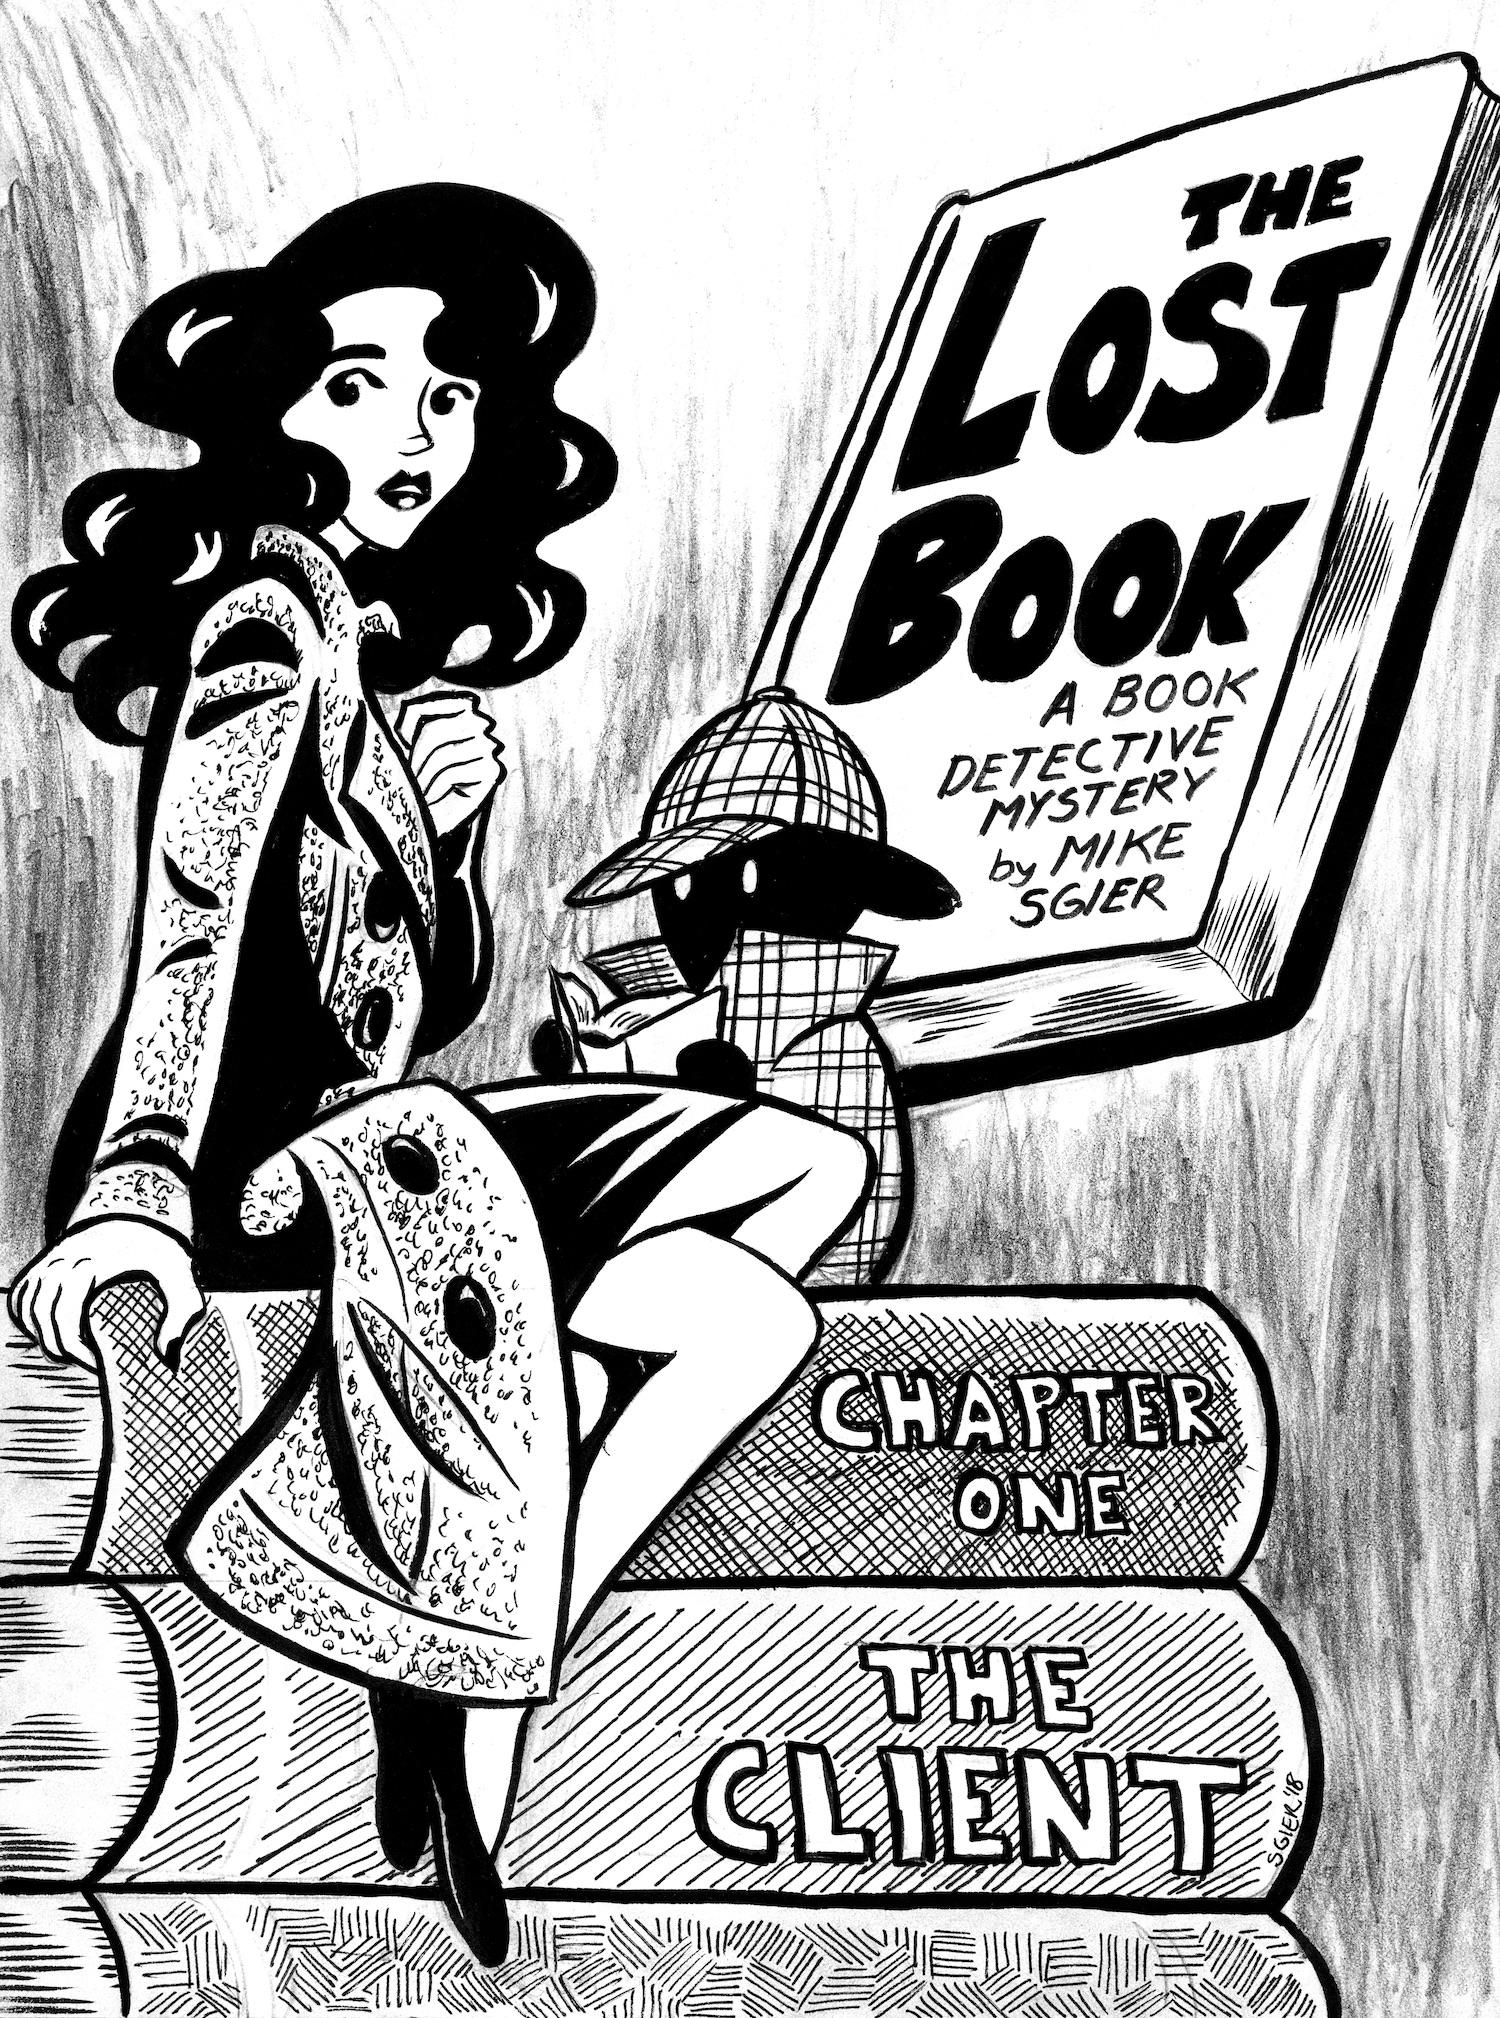 sgier-lostbook-cover.jpg